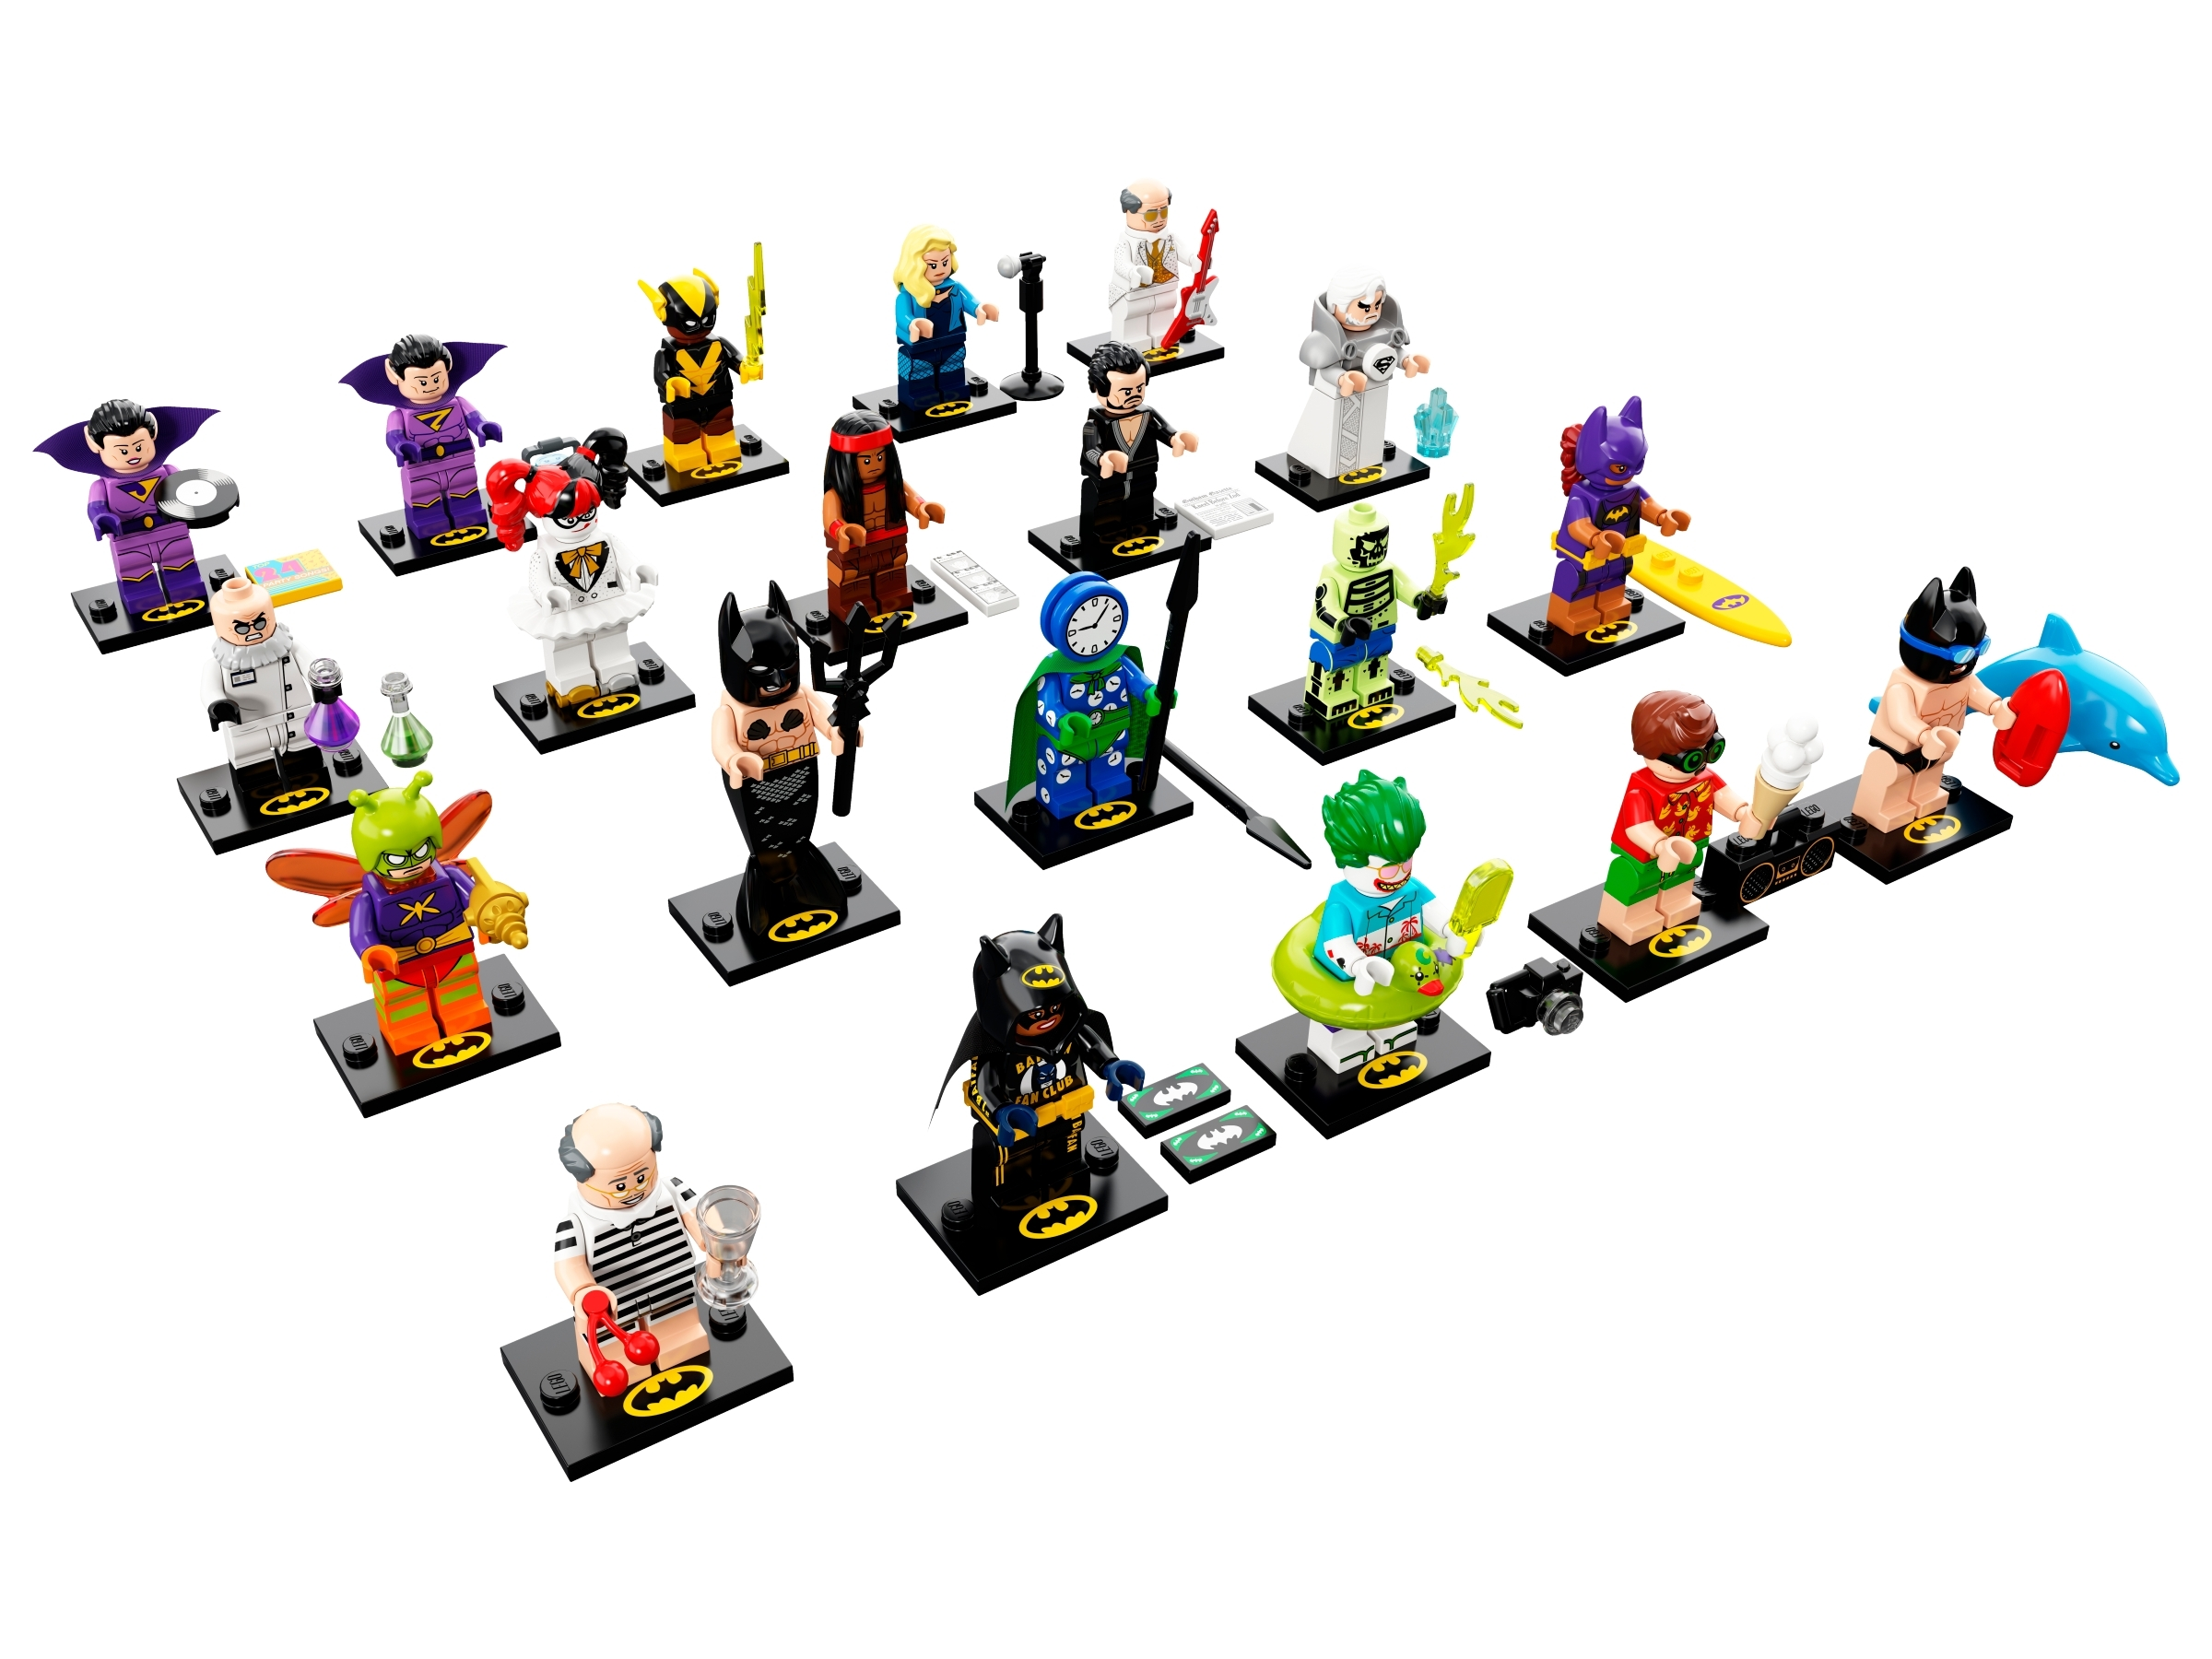 Black Vulcan NEW LEGO 71020 BATMAN MOVIE MINIFIGURES SERIES 2